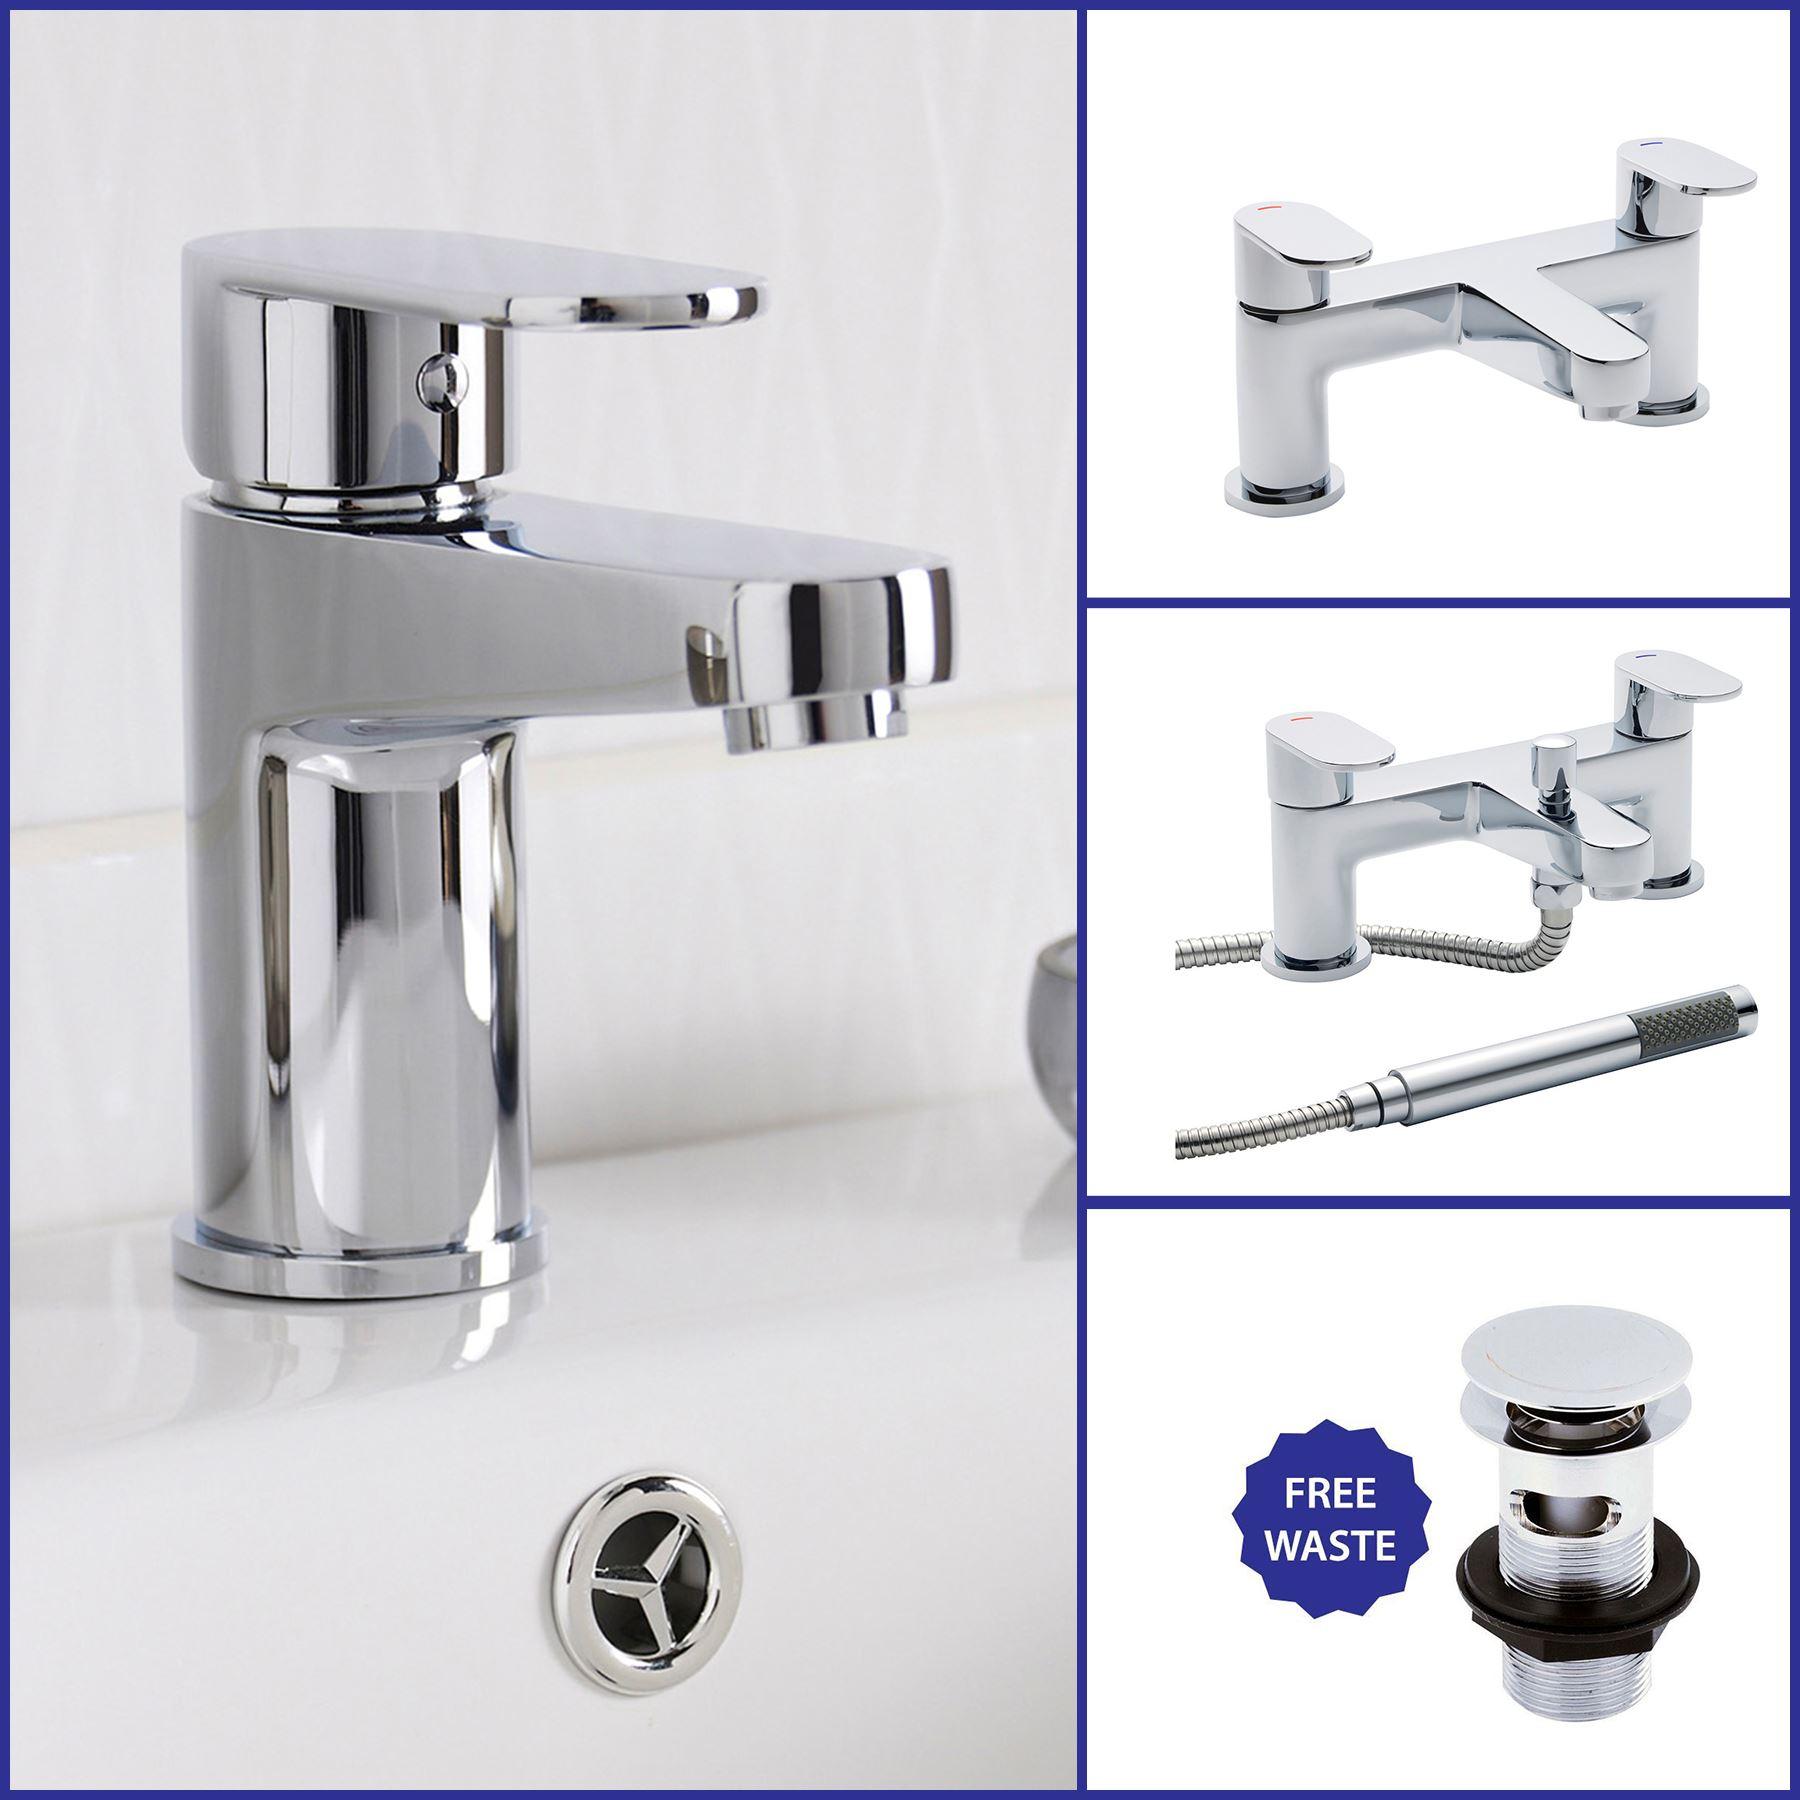 Modern Chrome Bathroom Taps Sink Basin Bath Filler Shower Mixer Set ...